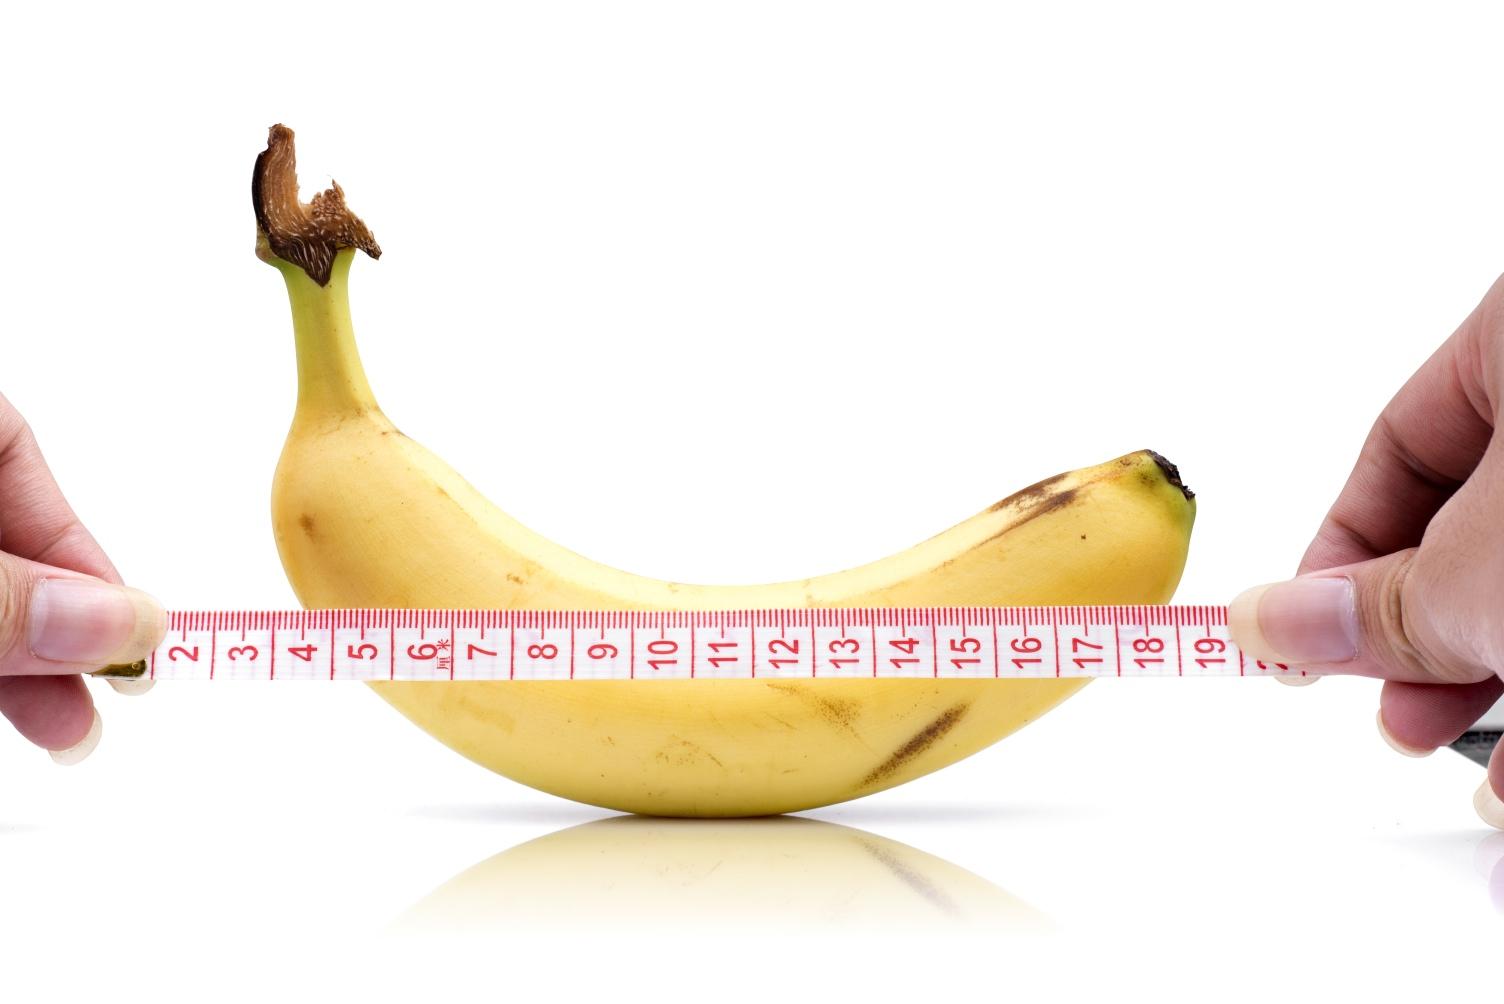 banana and tape measure